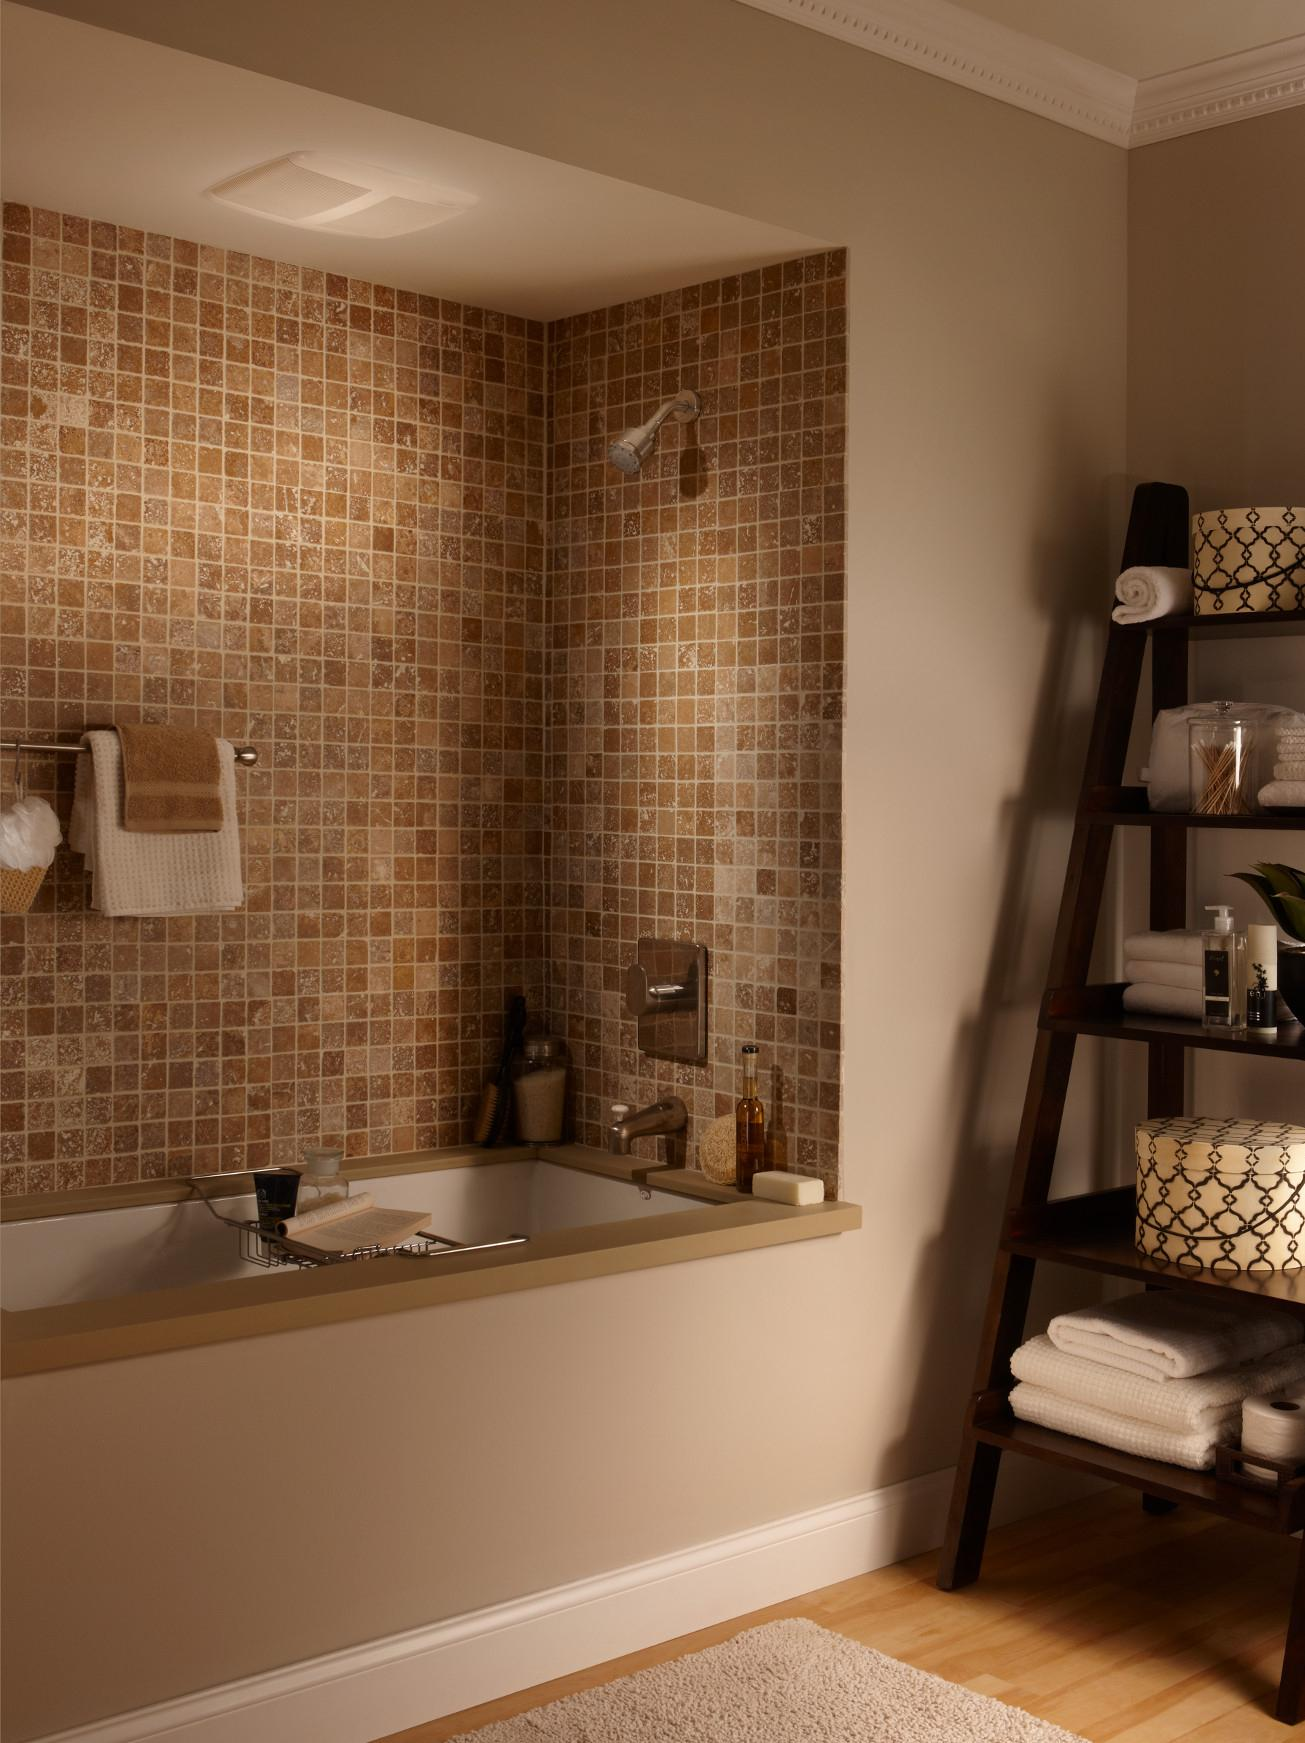 Broan Qtr080 Ultra Silent Bath Fan 1 0 Sones 80 Cfm Bathroom Fans